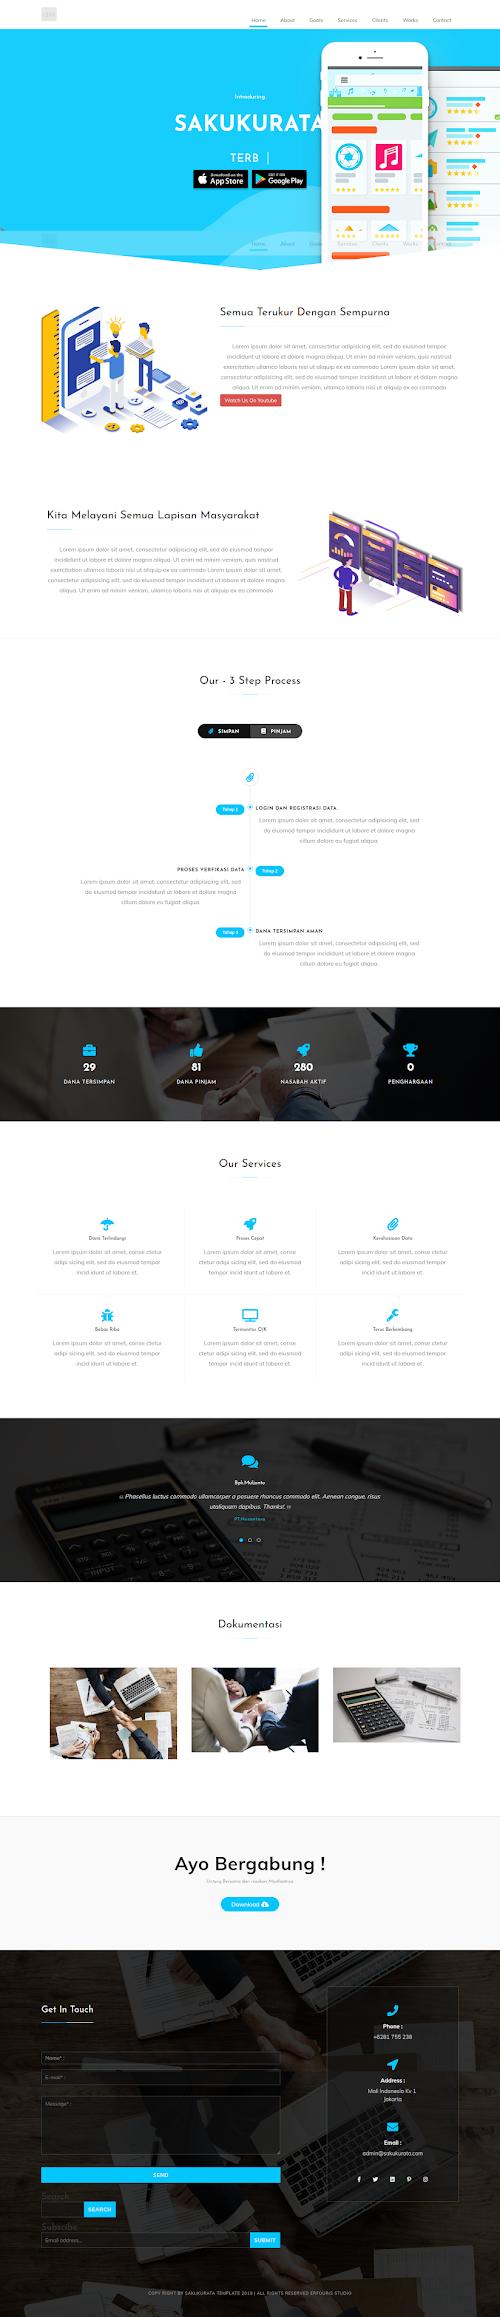 UKM Blogger Landing page Template : Sakukurata Fintech Style